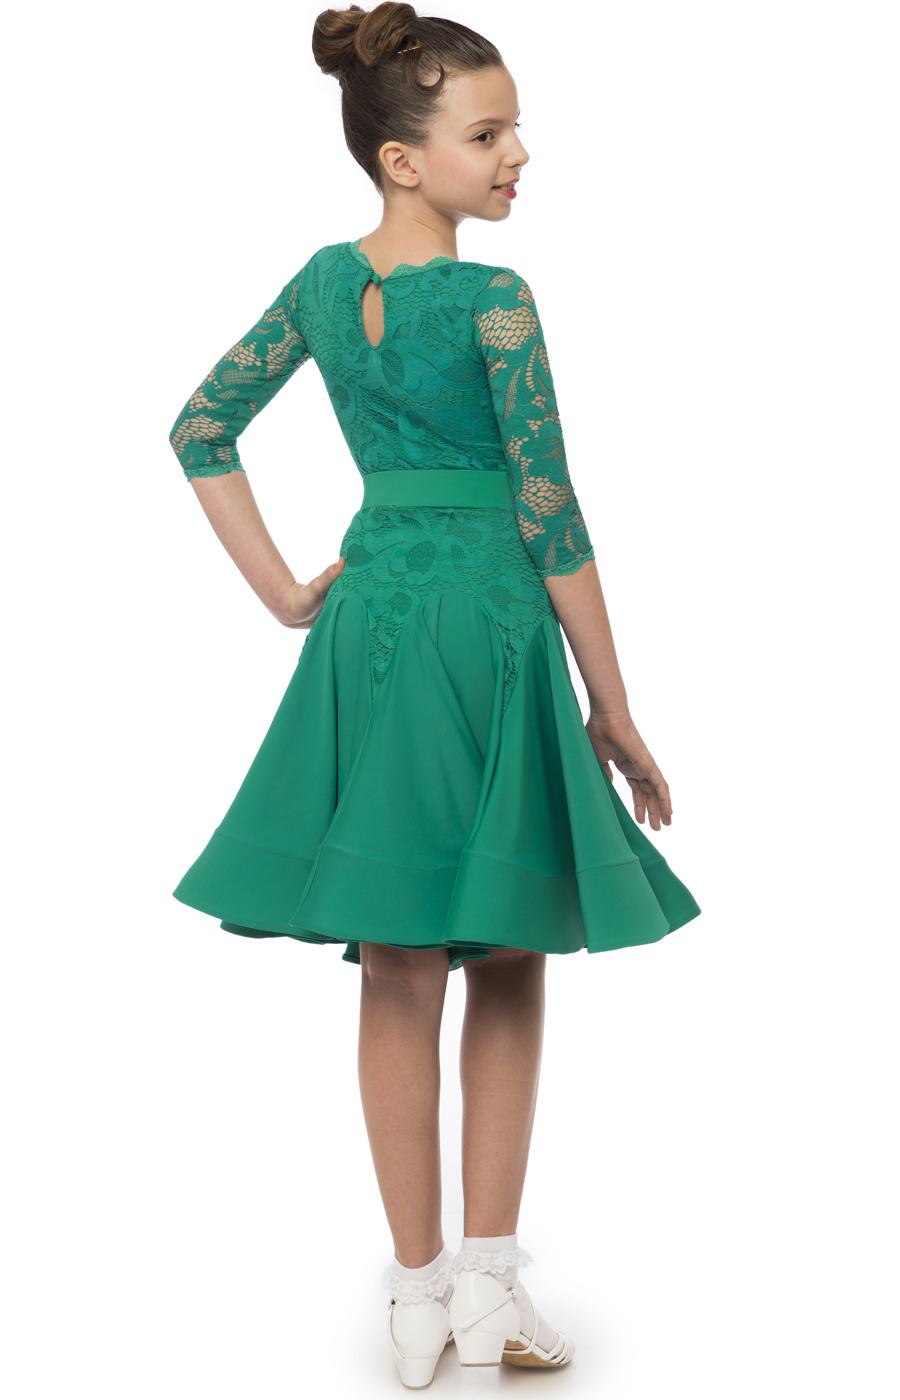 Debby juvenile dress